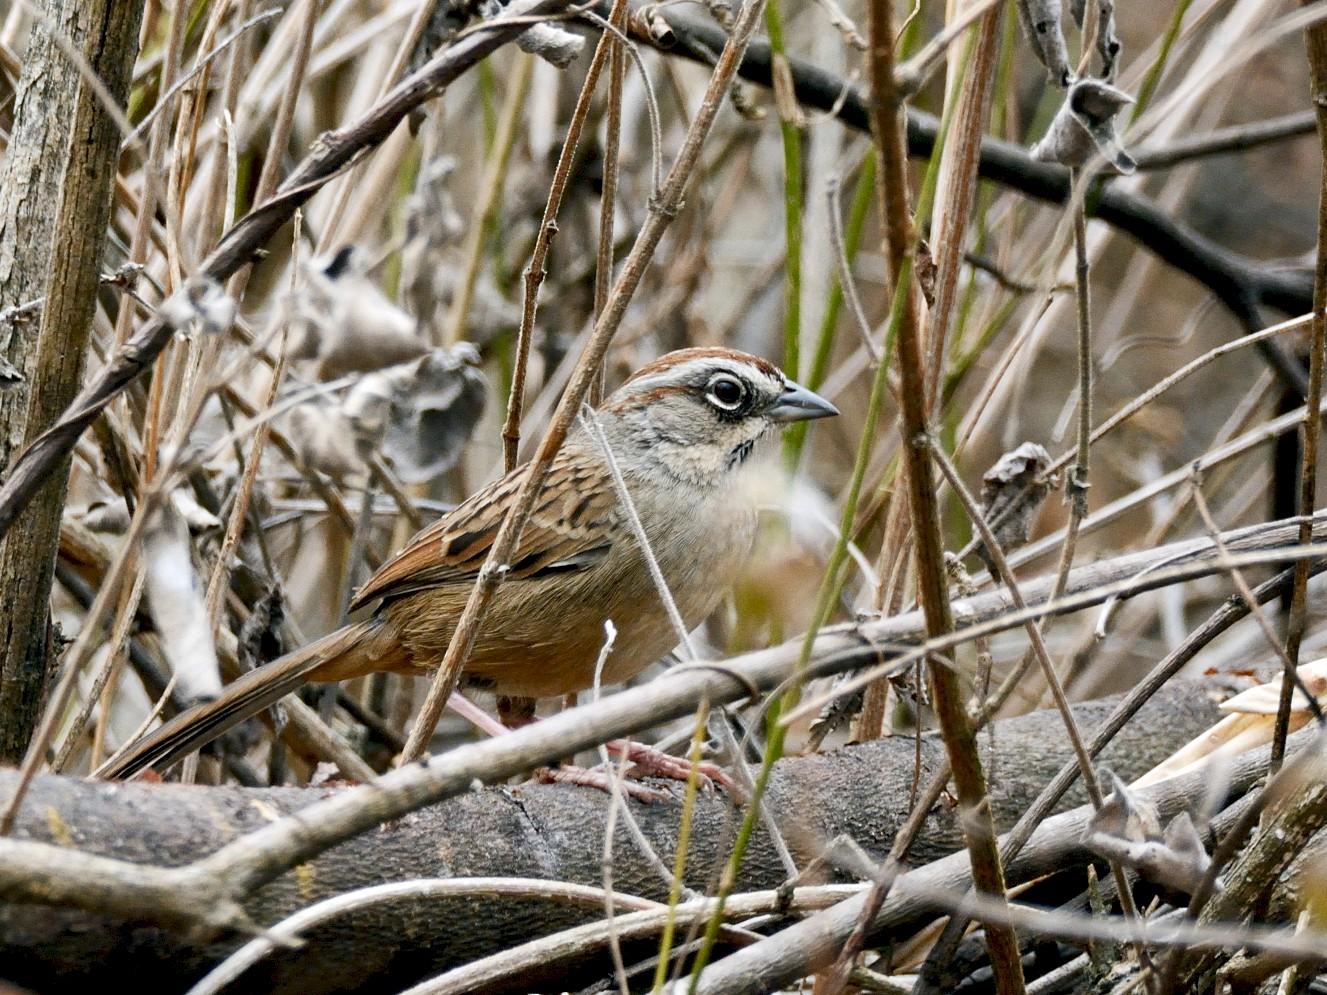 Oaxaca Sparrow - Miguel Angel Aguilar (Birdnomad)